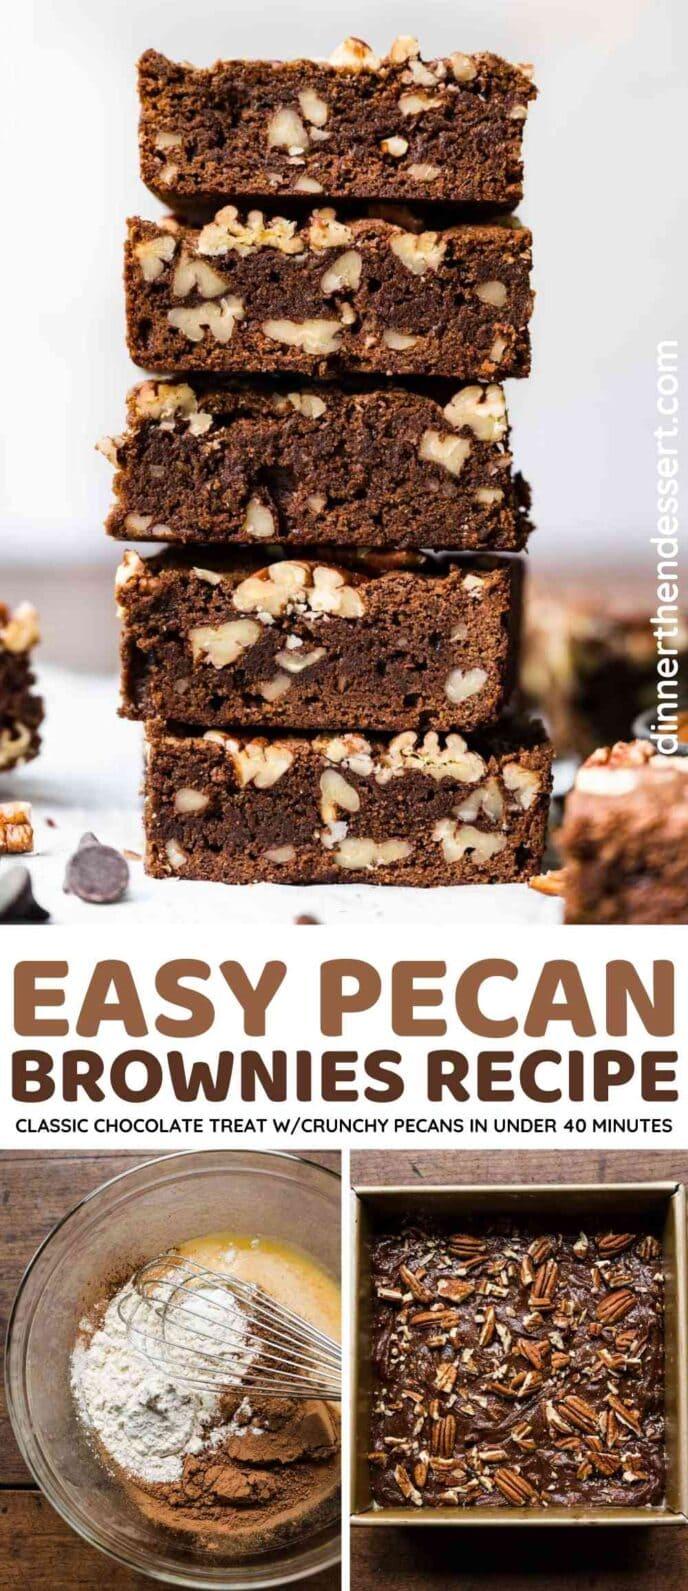 Pecan Brownies Collage